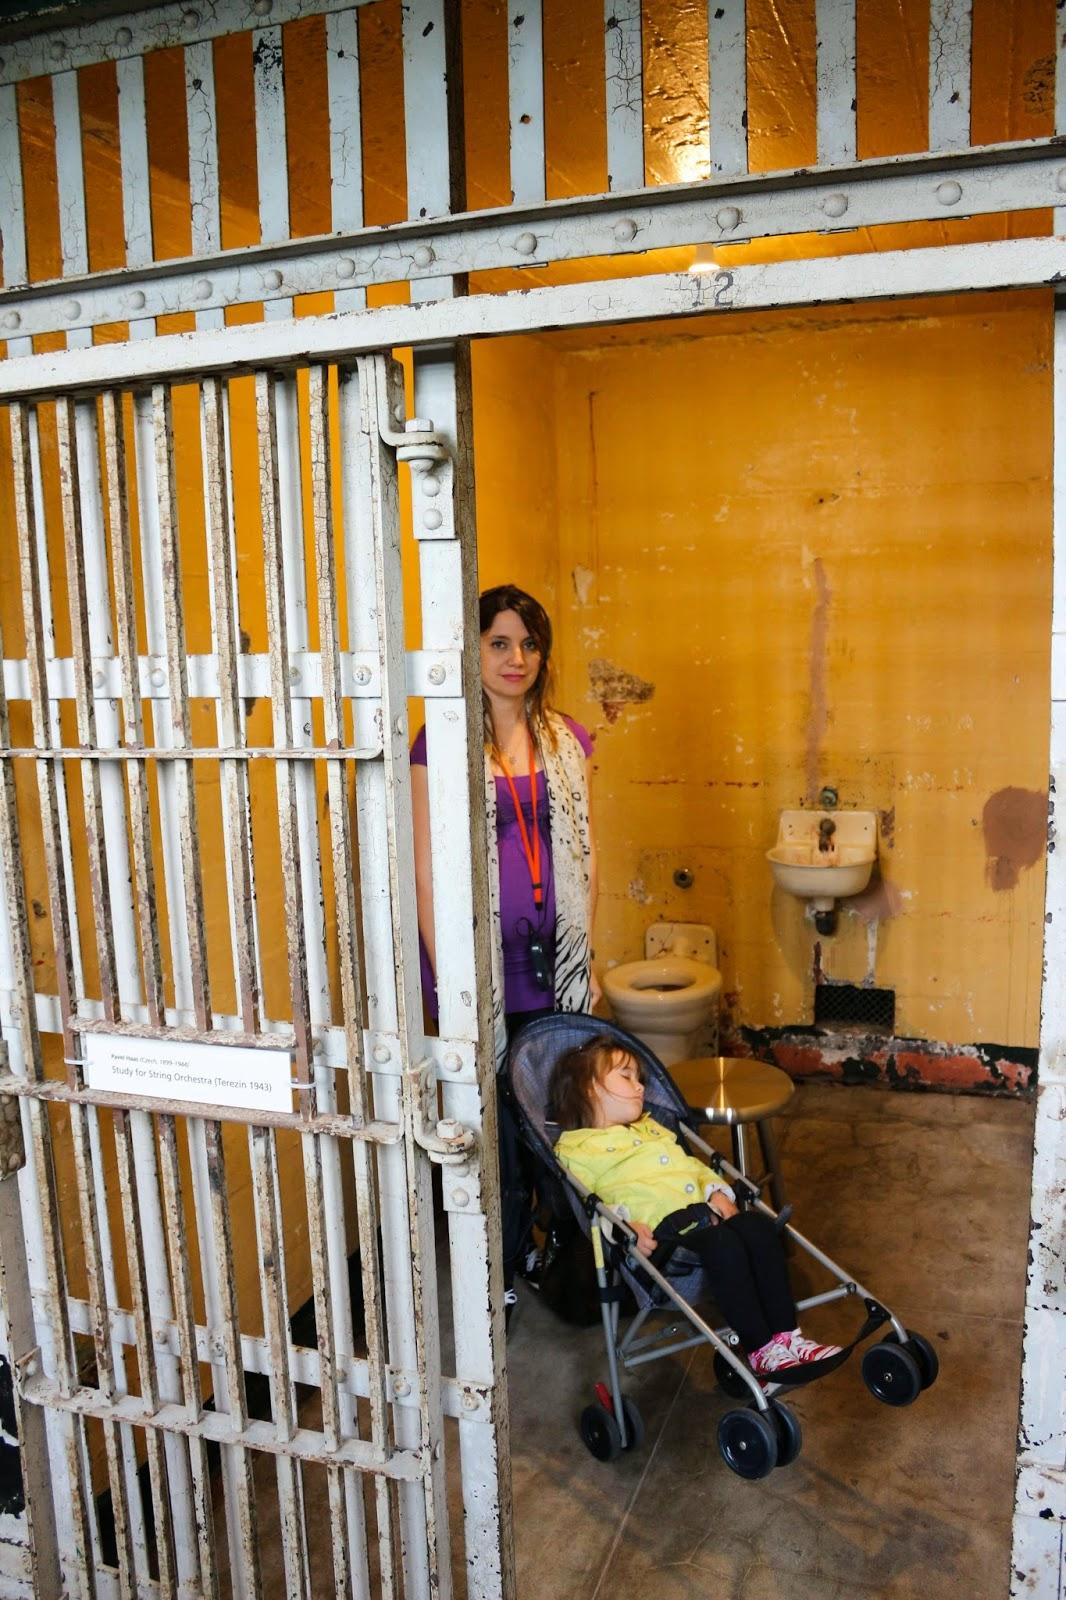 Alcatraz Penitenciary